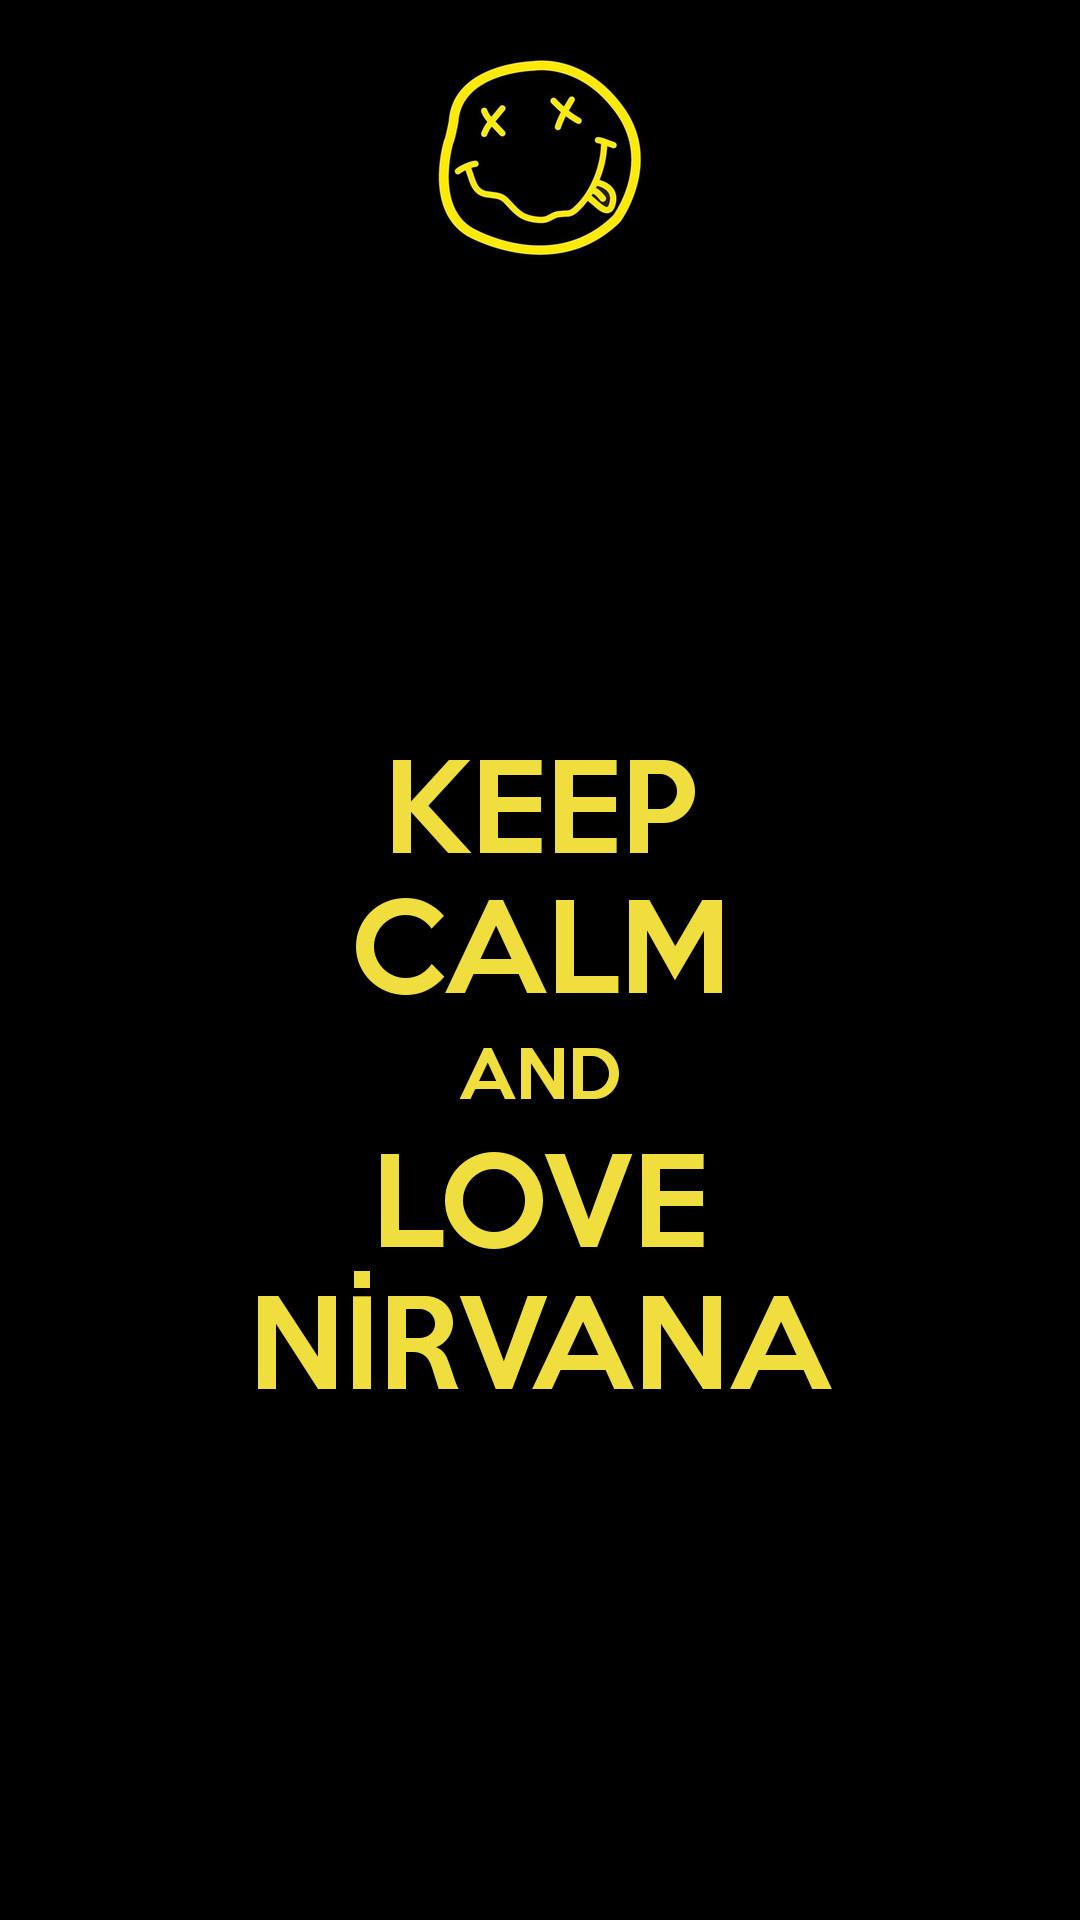 Top 50 Logo: Nirvana Logo Wallpaper (50+ Images